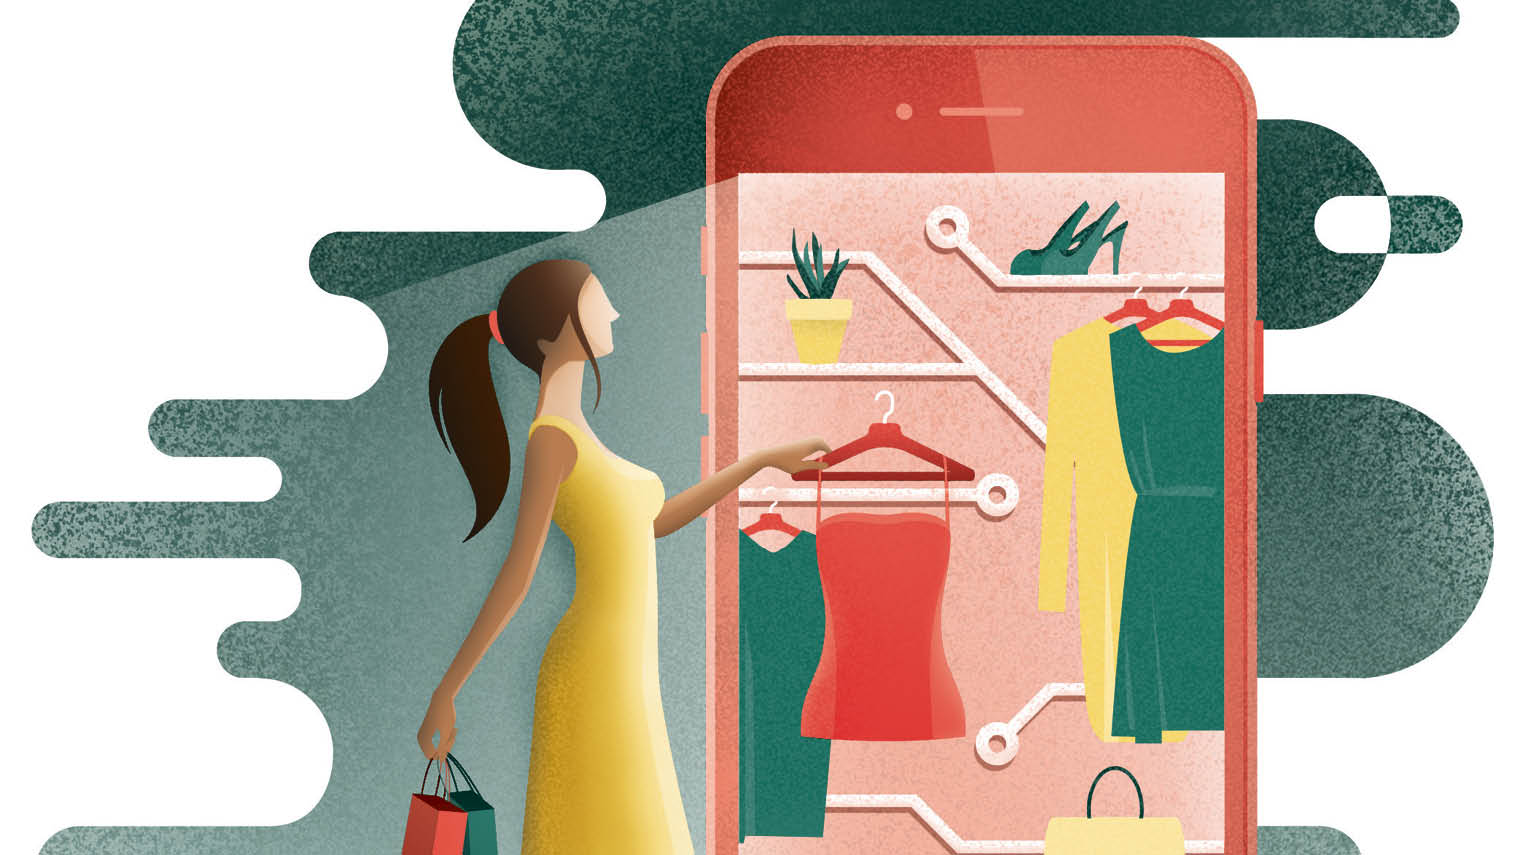 Illustration of ethical commerce